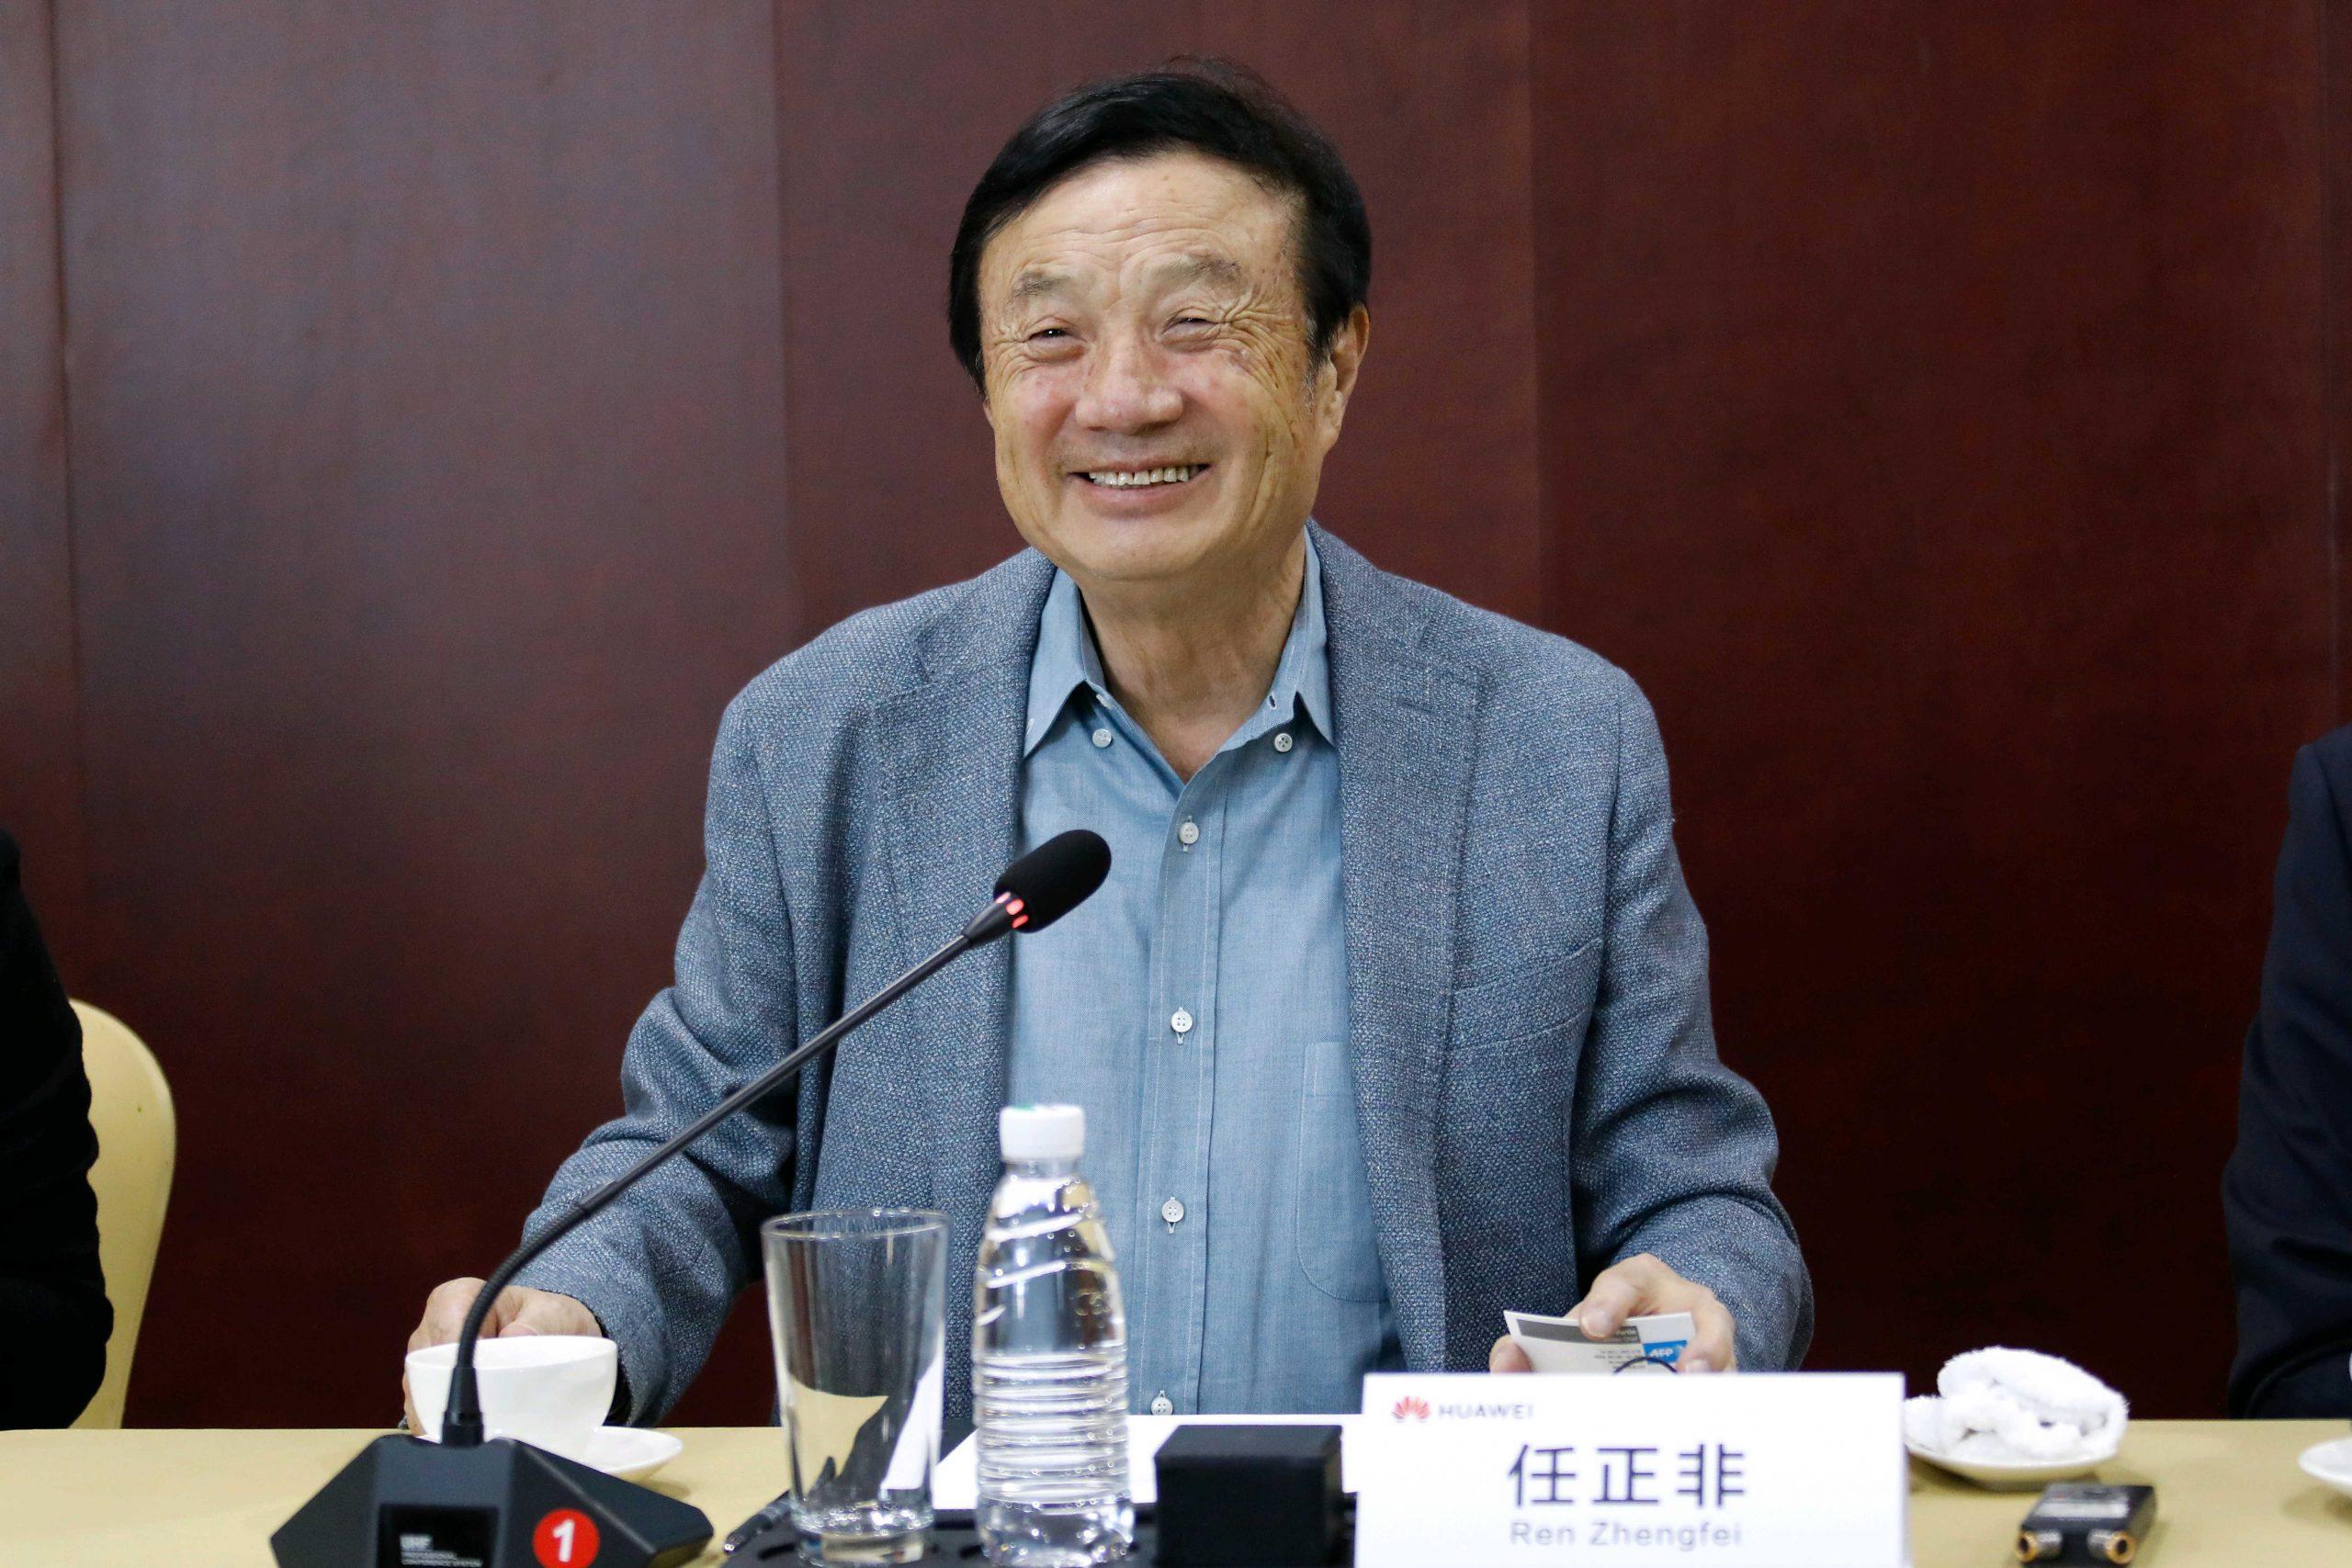 Huawei founder Ren Zhengfei hopes for improved US-China relations